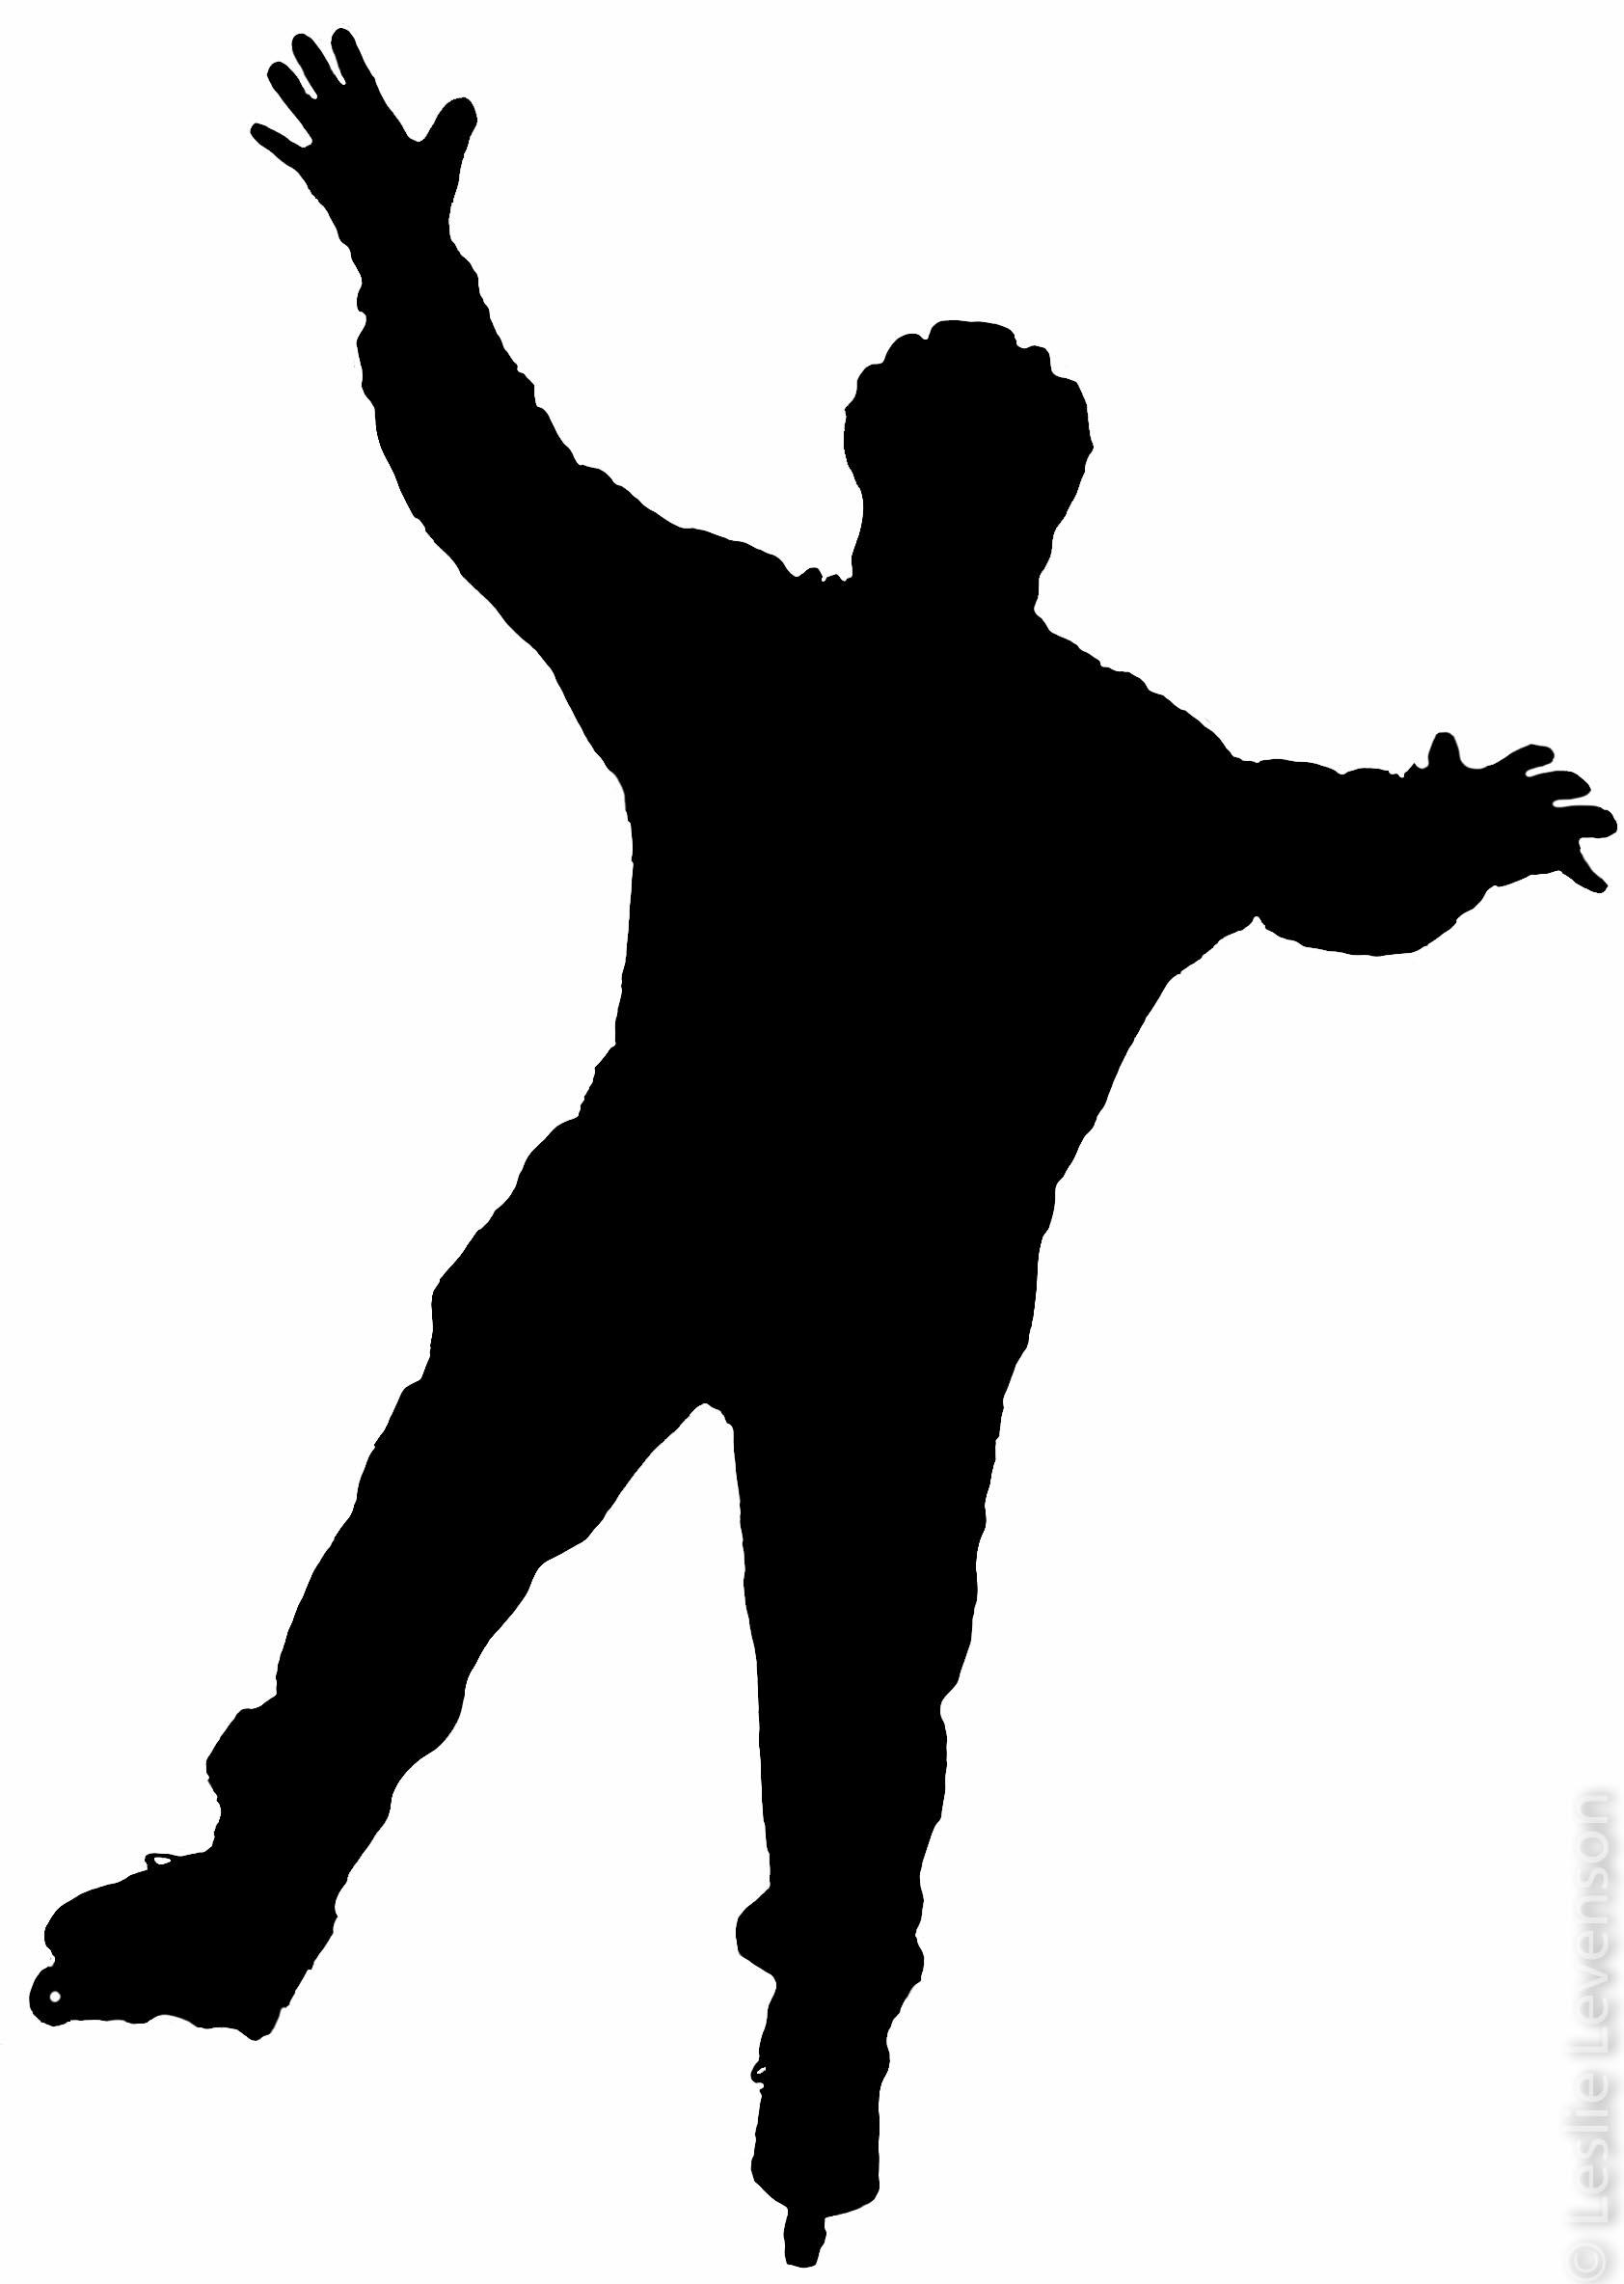 Levi on skates silhouette.jpg